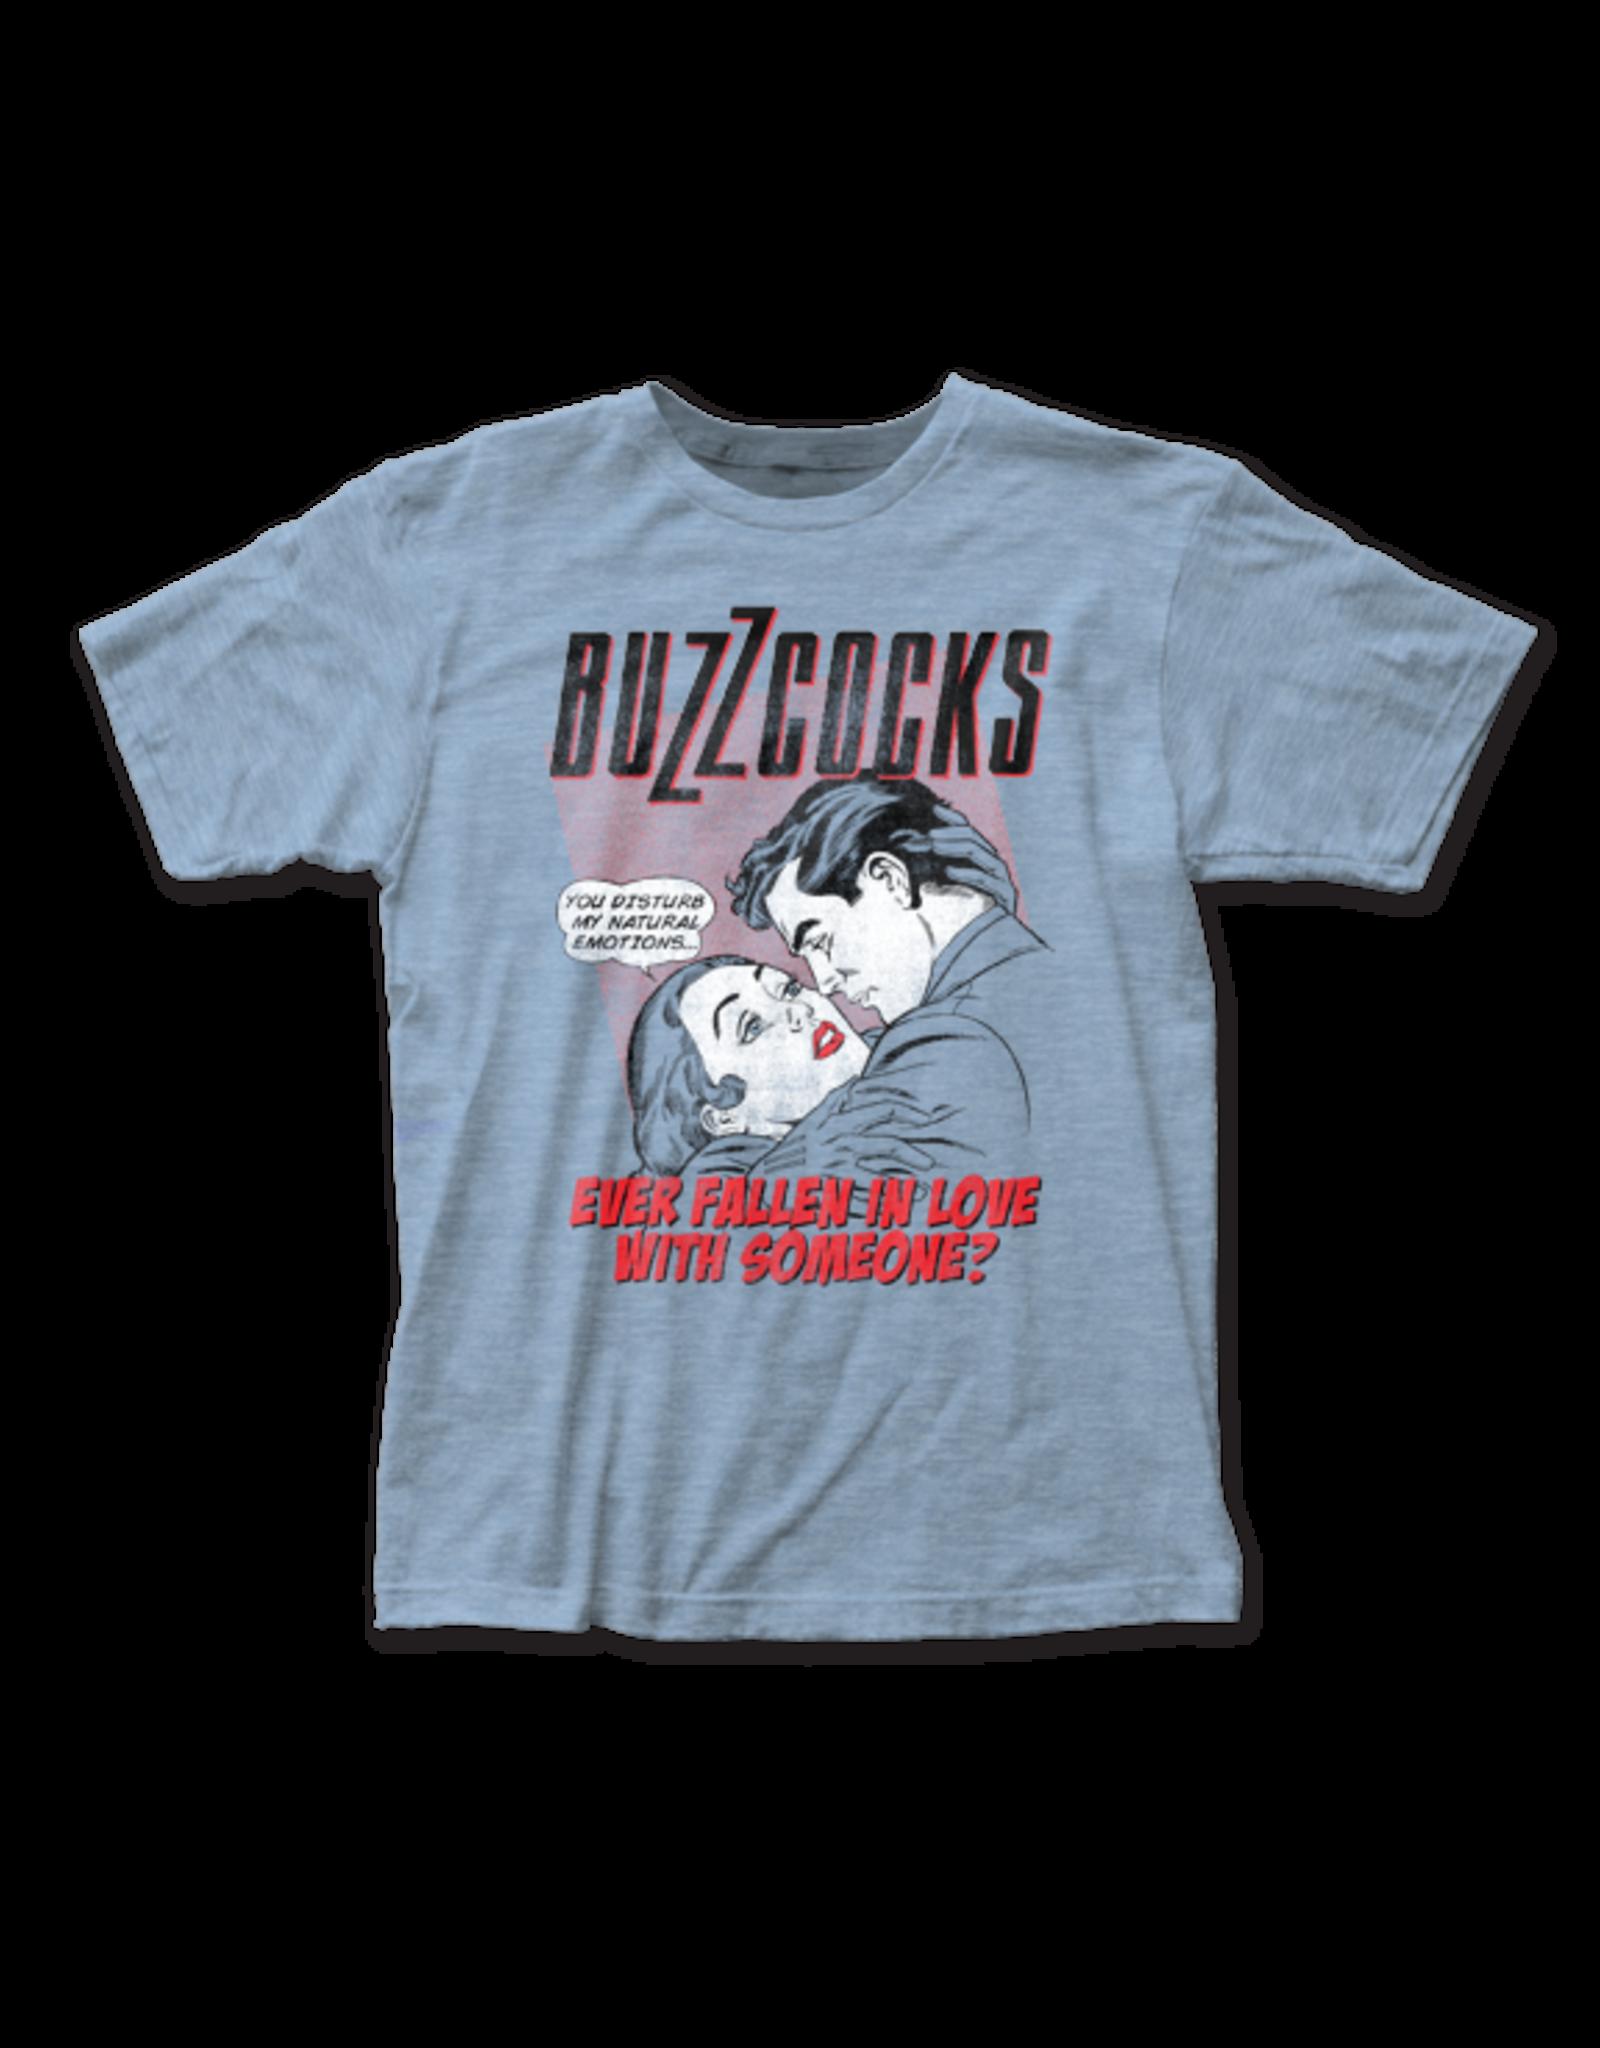 "Buzzcocks ""Fallen in love"" T-Shirt"